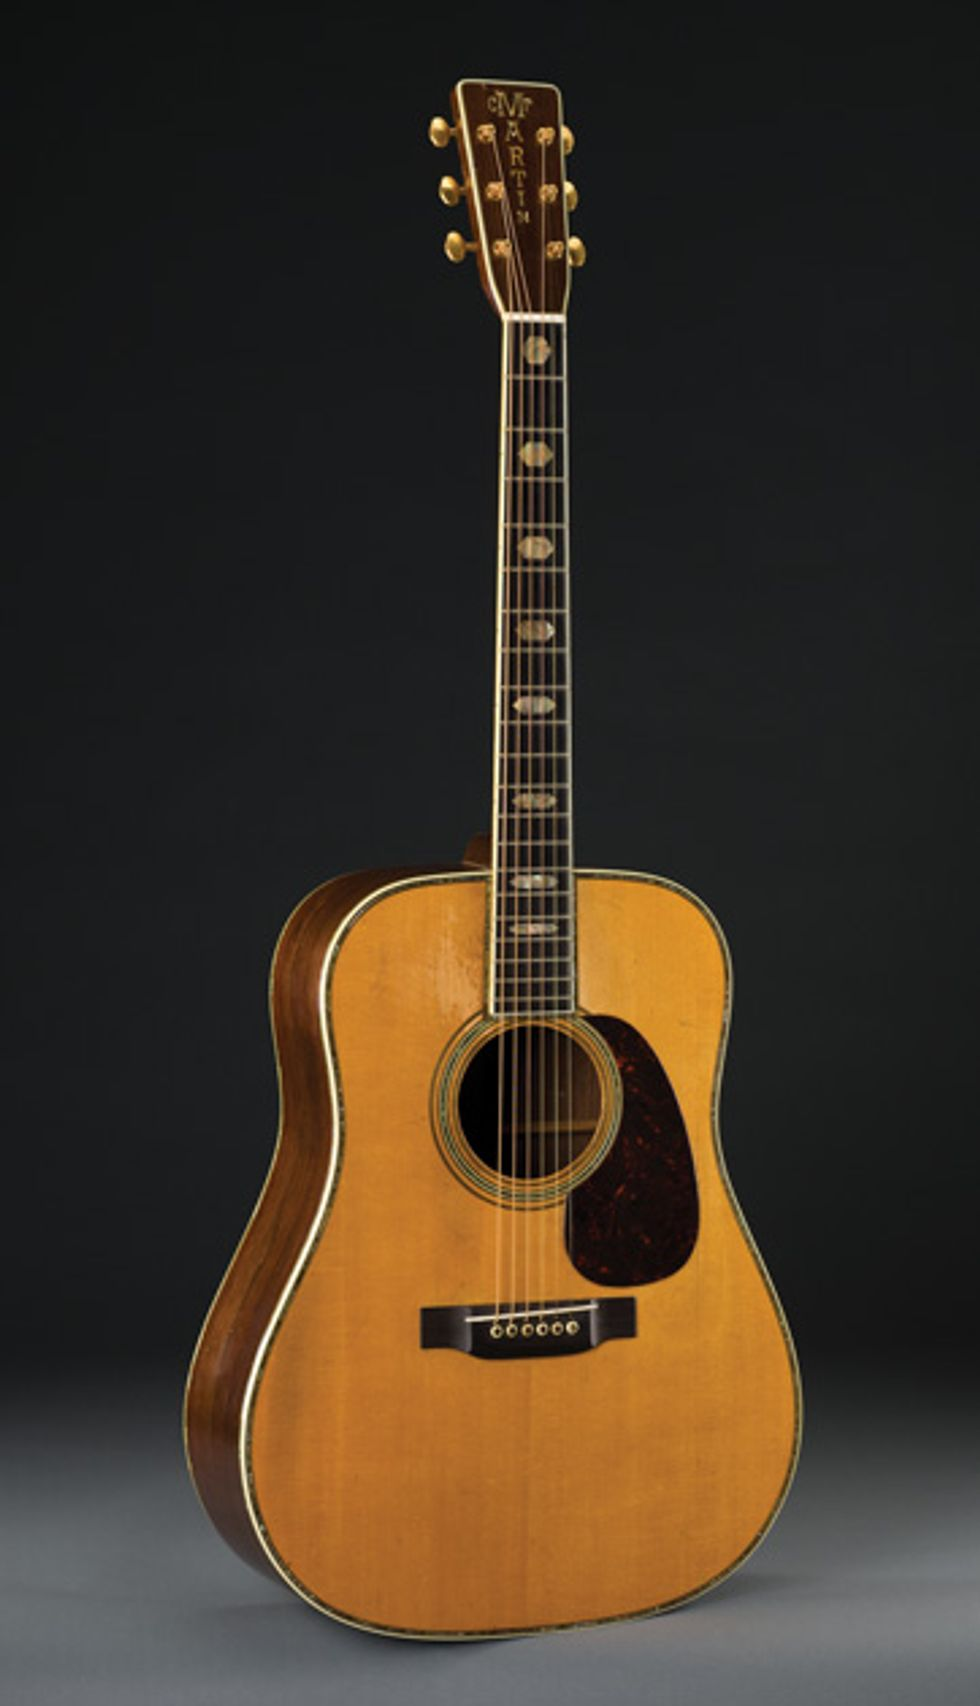 pre war perfection the martin d 45 premier guitar. Black Bedroom Furniture Sets. Home Design Ideas